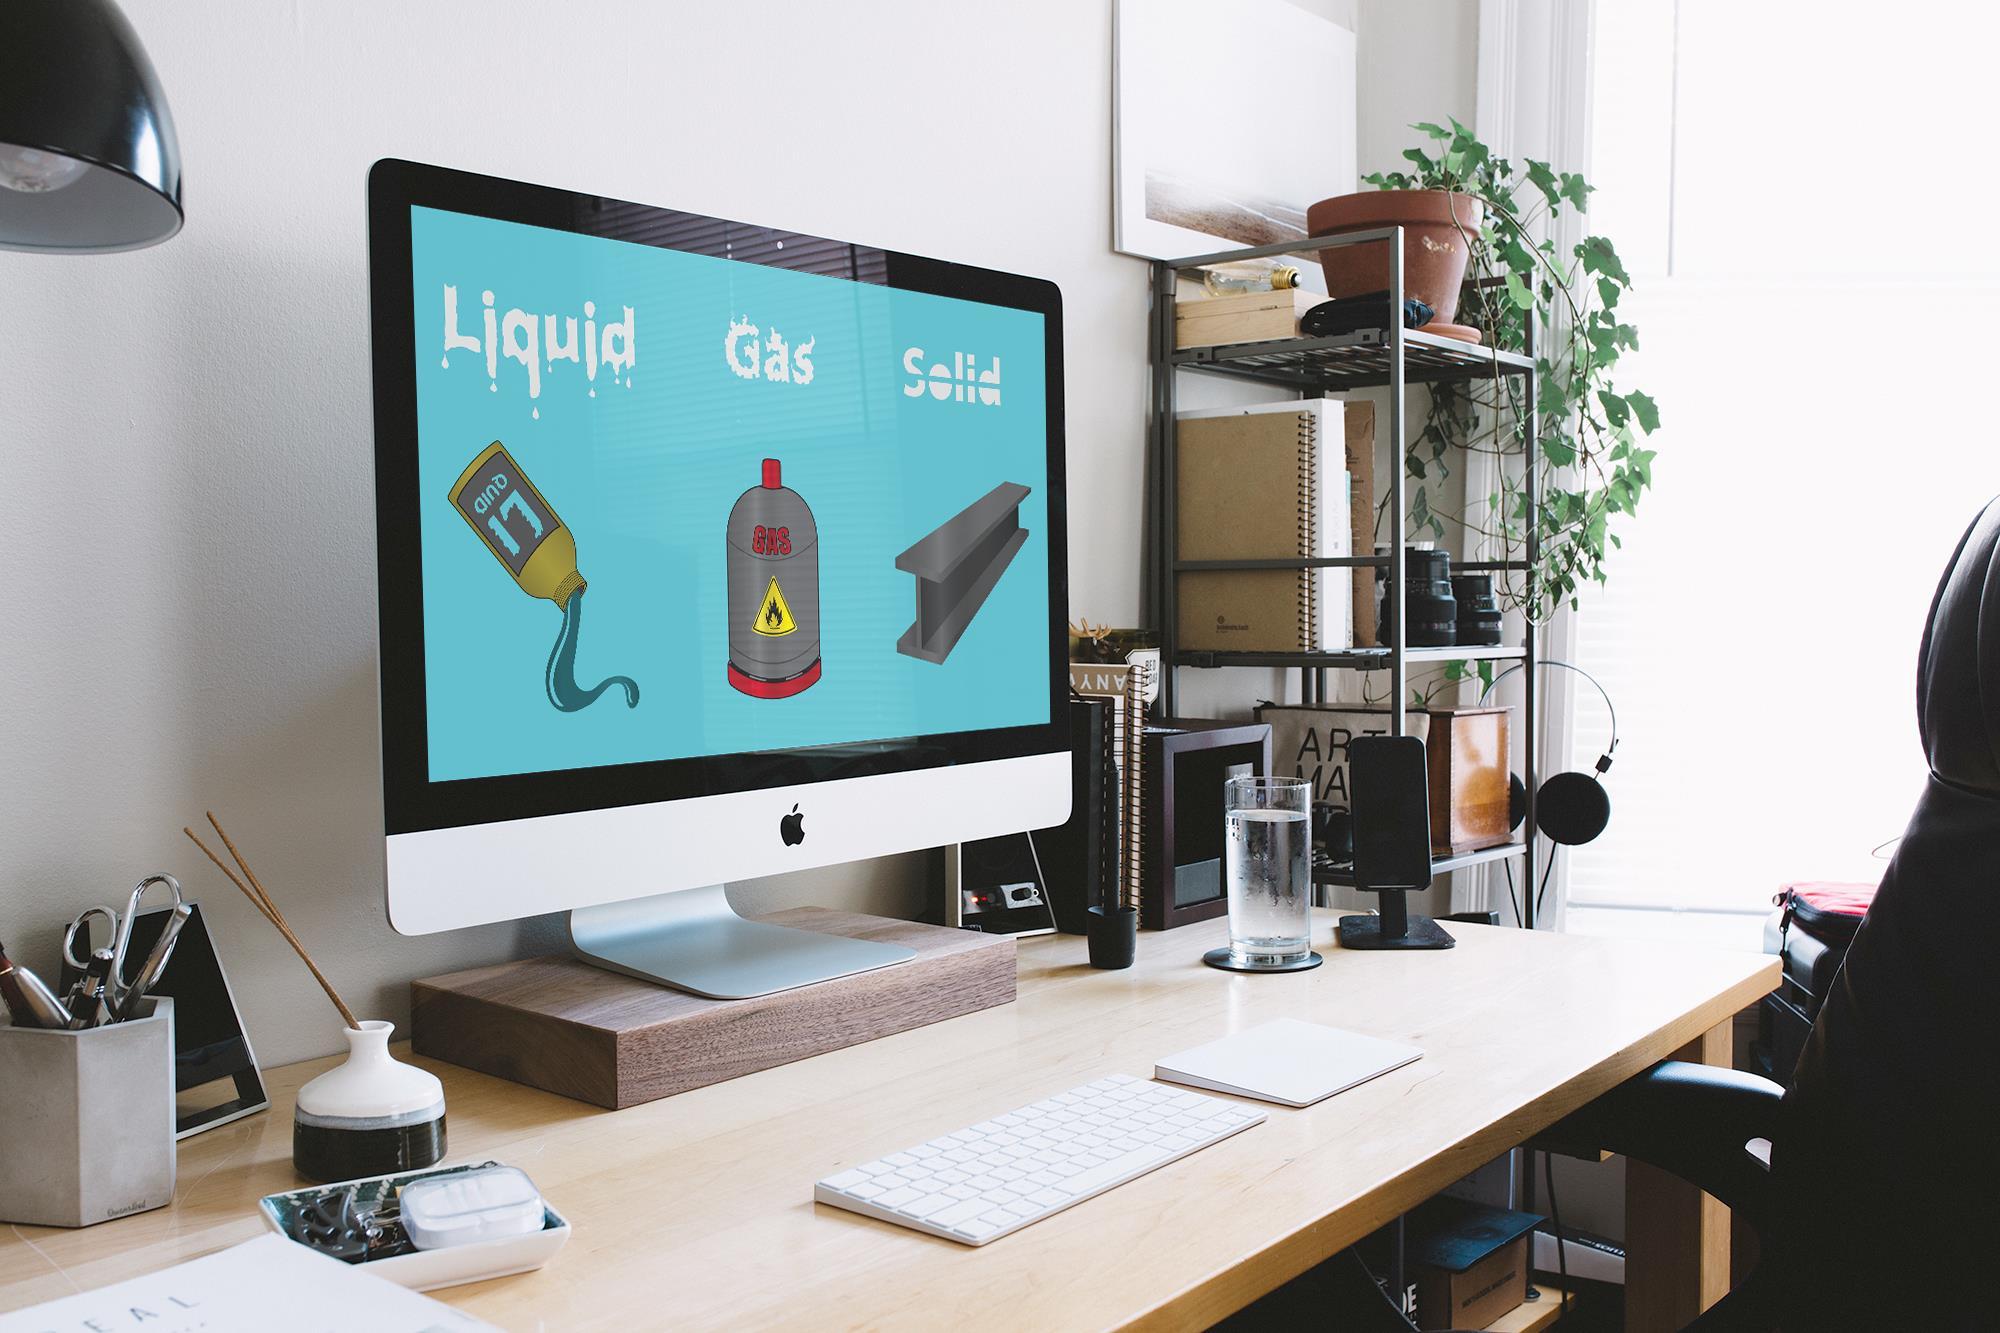 Liquid, Gas and Solid Illustration